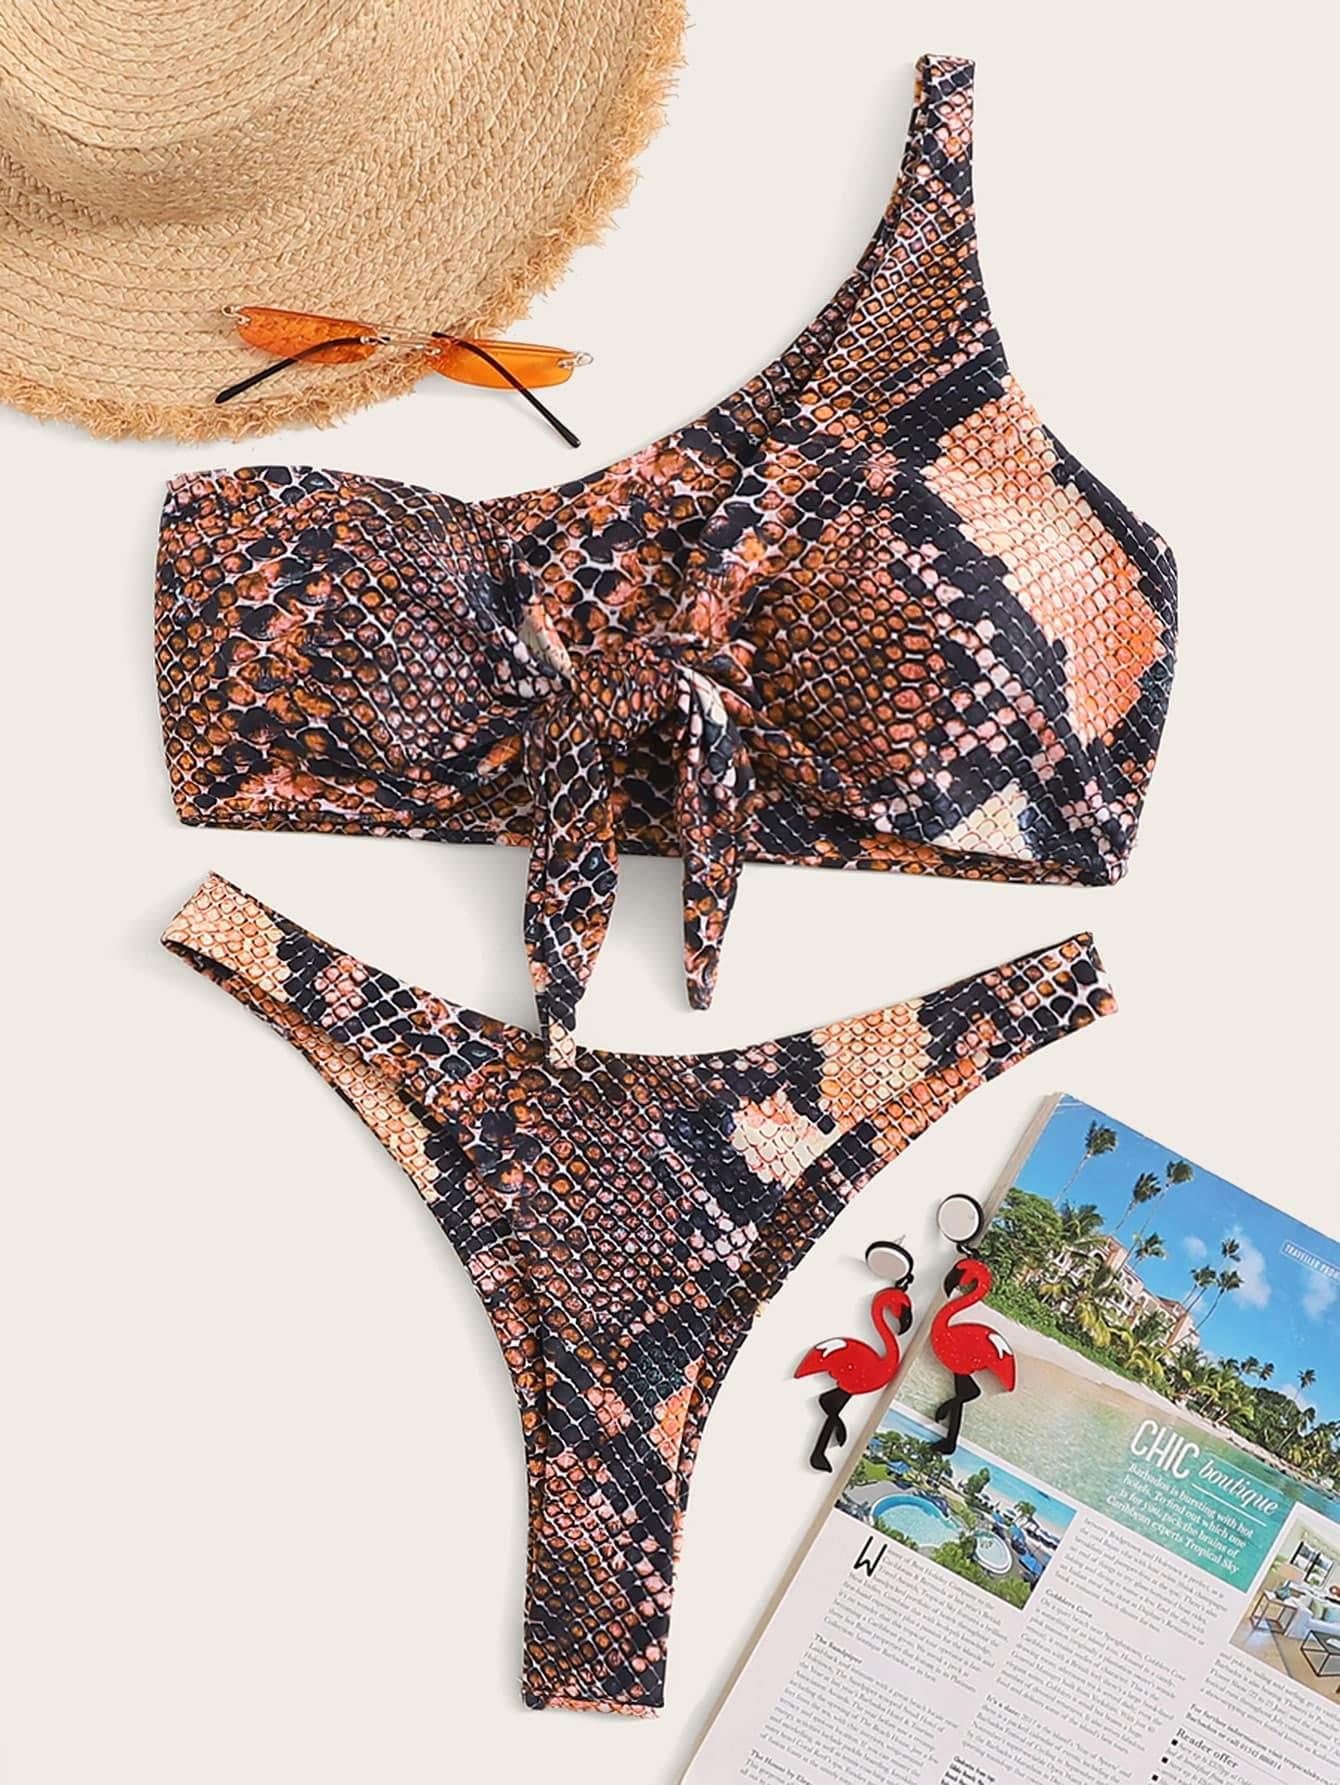 3f3f5153d0f3 Snakeskin One Shoulder Top With High Cut Bikini - Popviva #swimwear  #sportswear #monokini